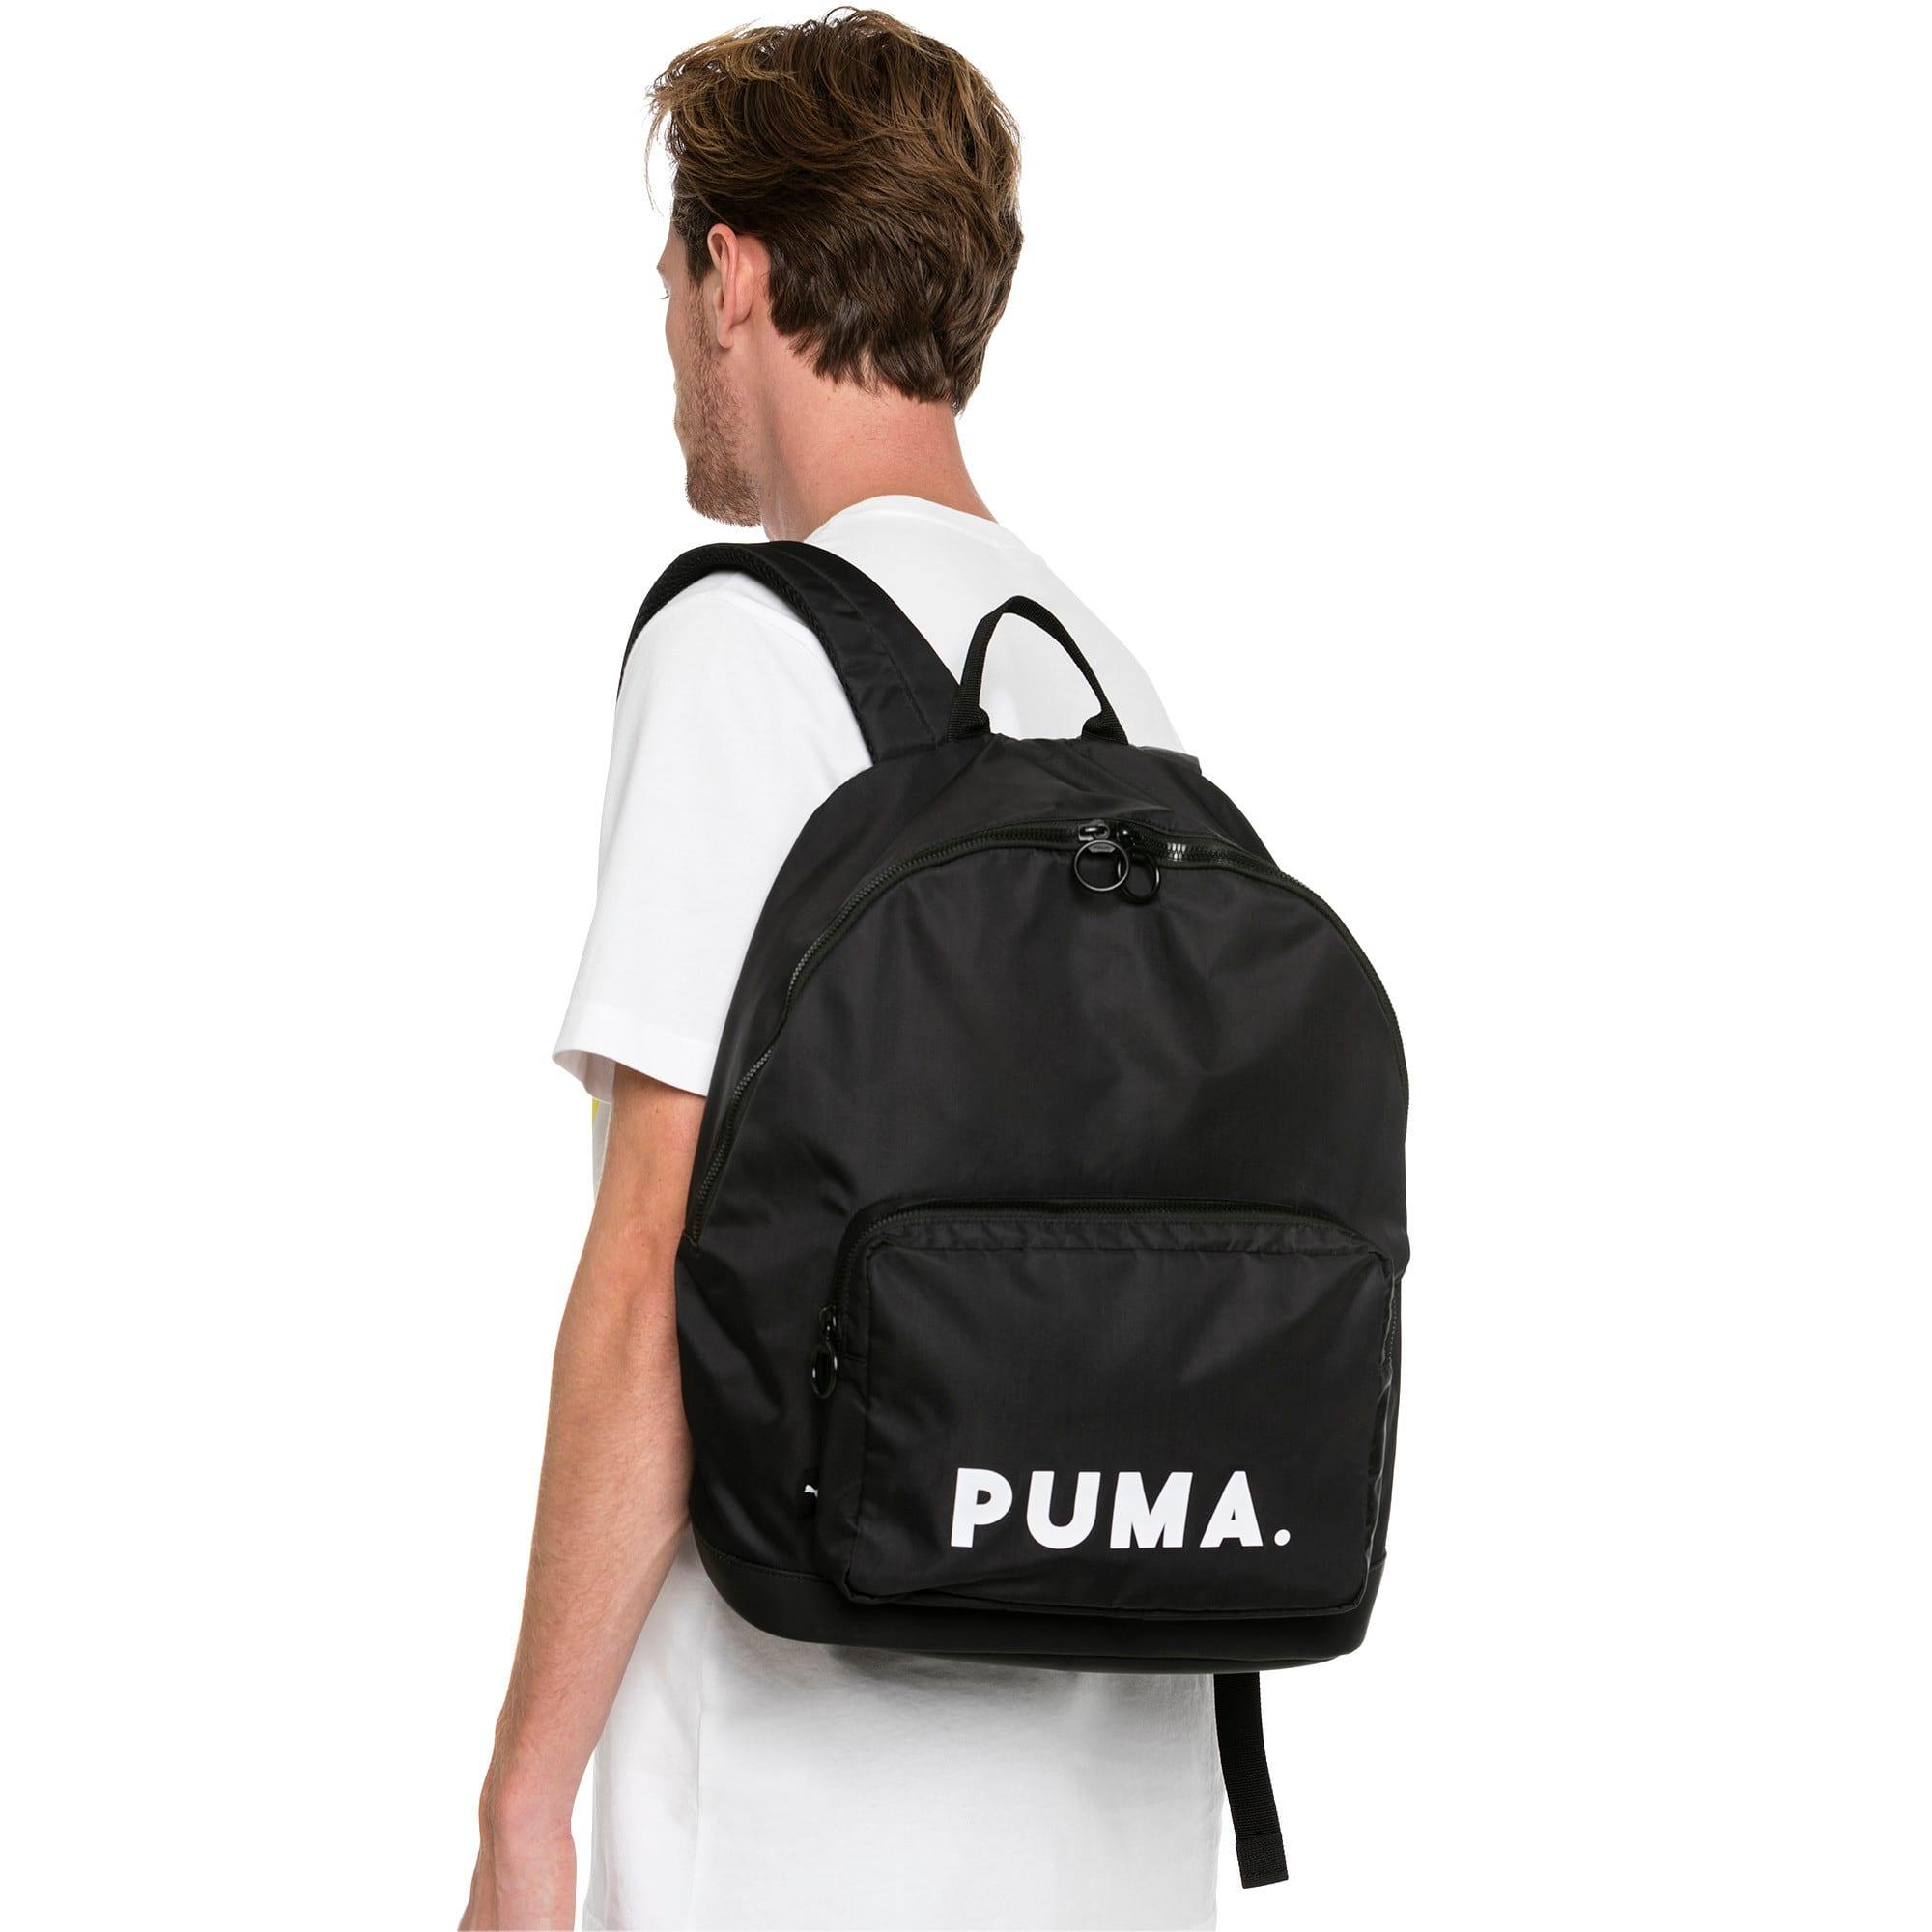 Thumbnail 2 of オリジナルス バックパック トレンド 24L, Puma Black, medium-JPN